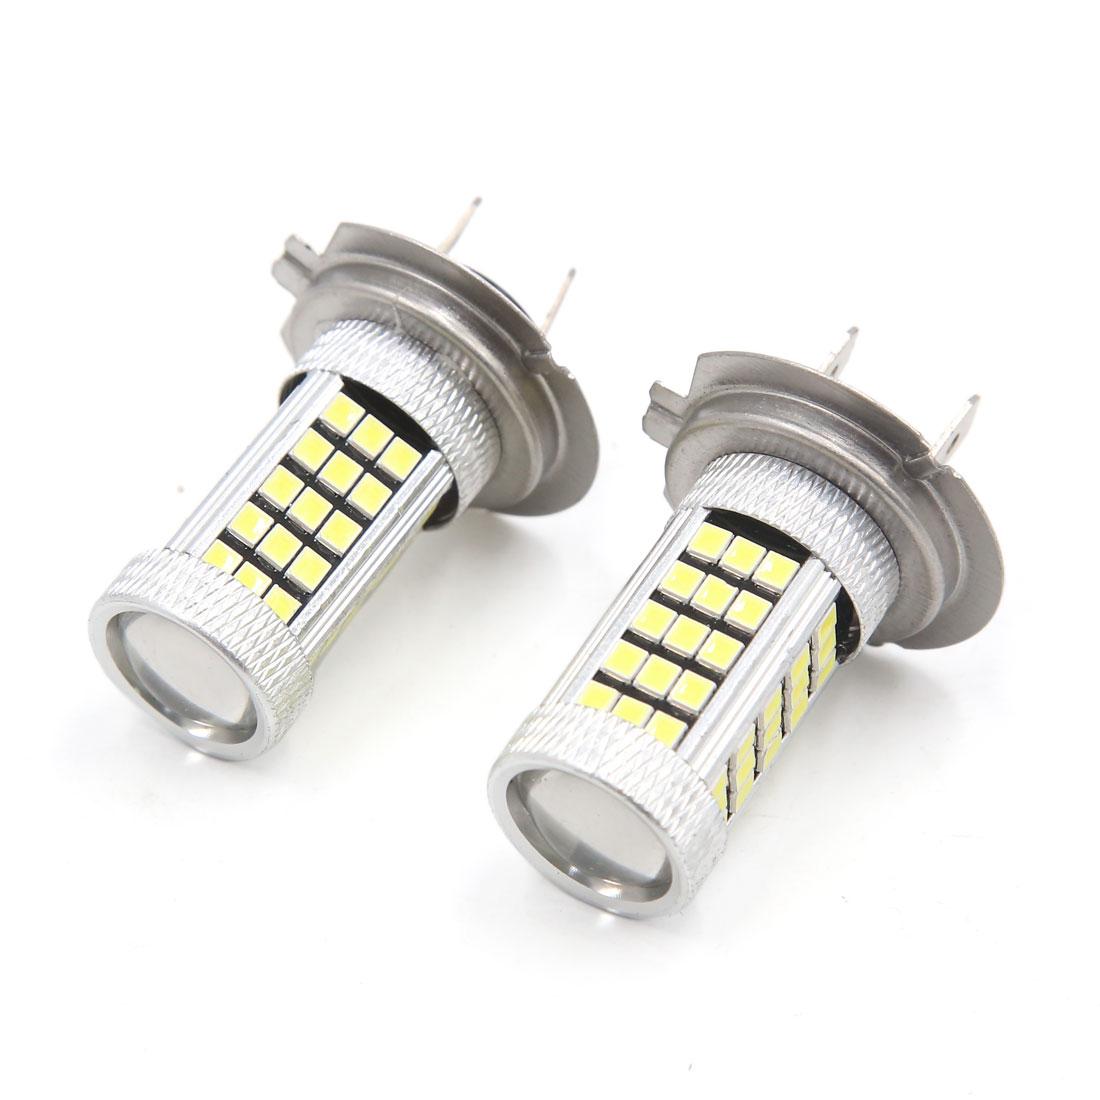 2Pcs Silver Tone Shell H7 White 2832 SMD 66 LEDs Lens Fog Headlight Bulb for Car